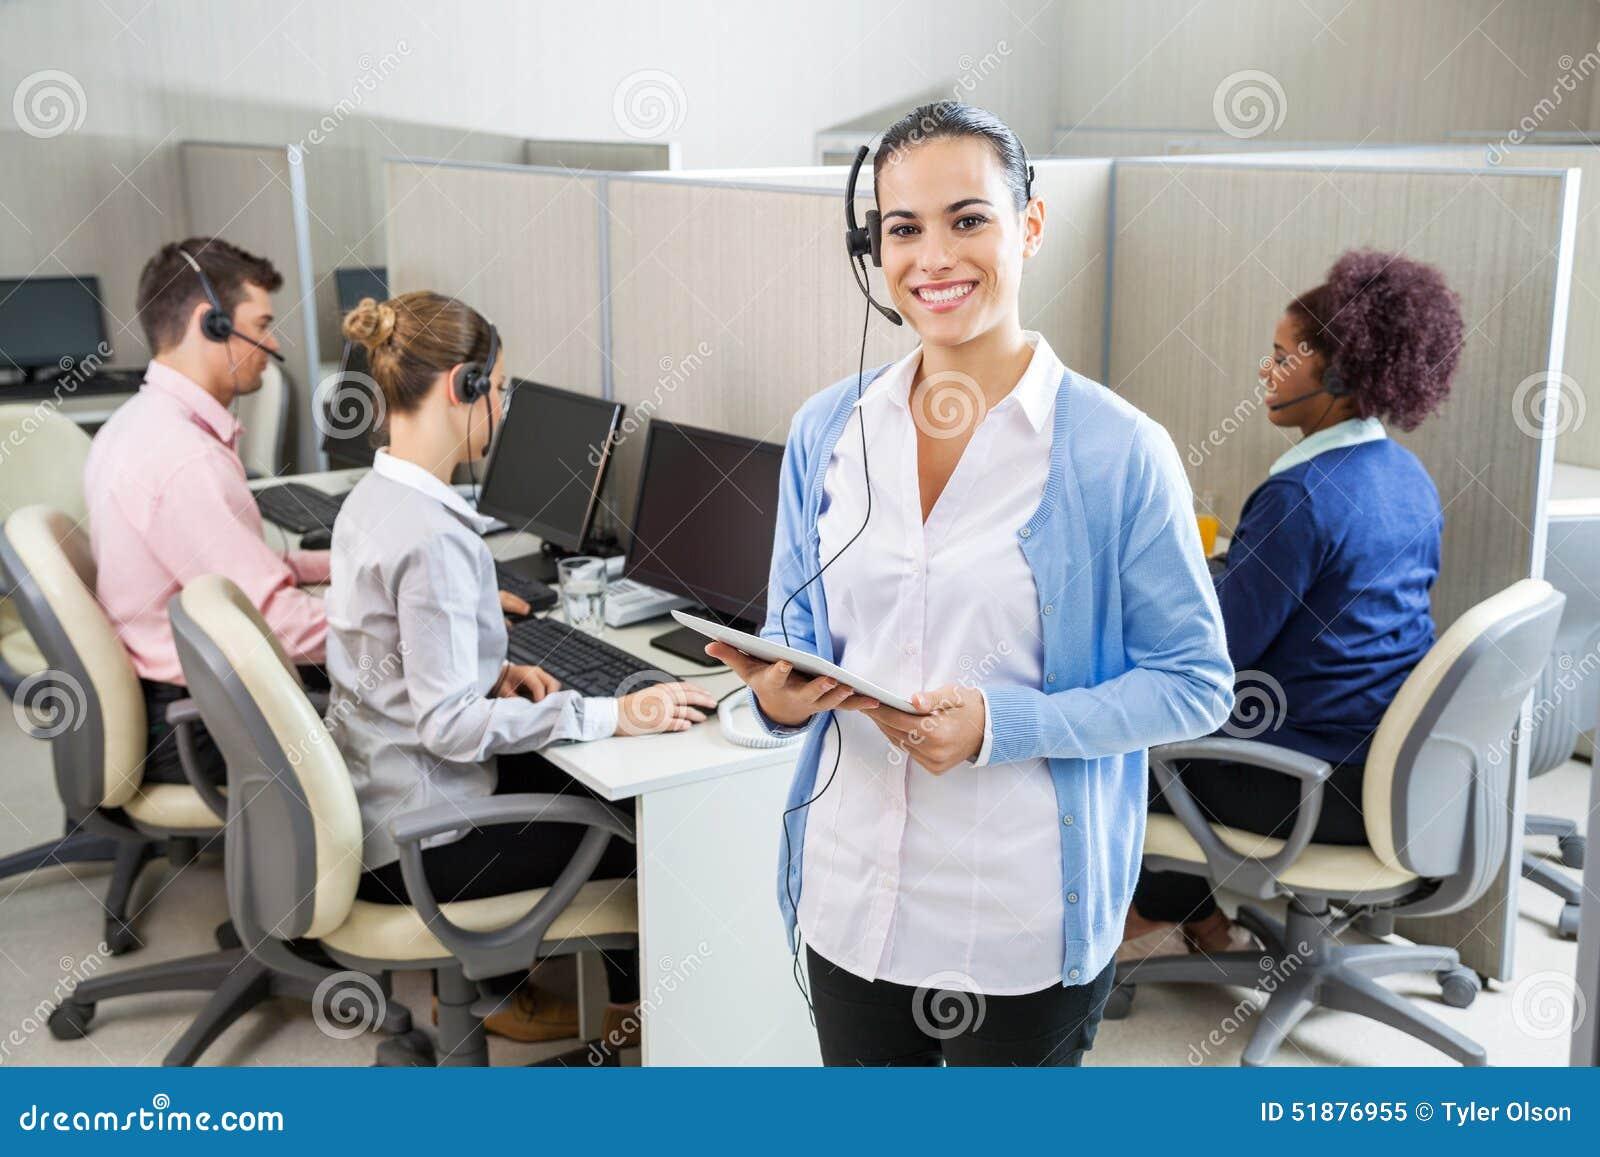 Happy Customer Service Representative Holding Stock Photo